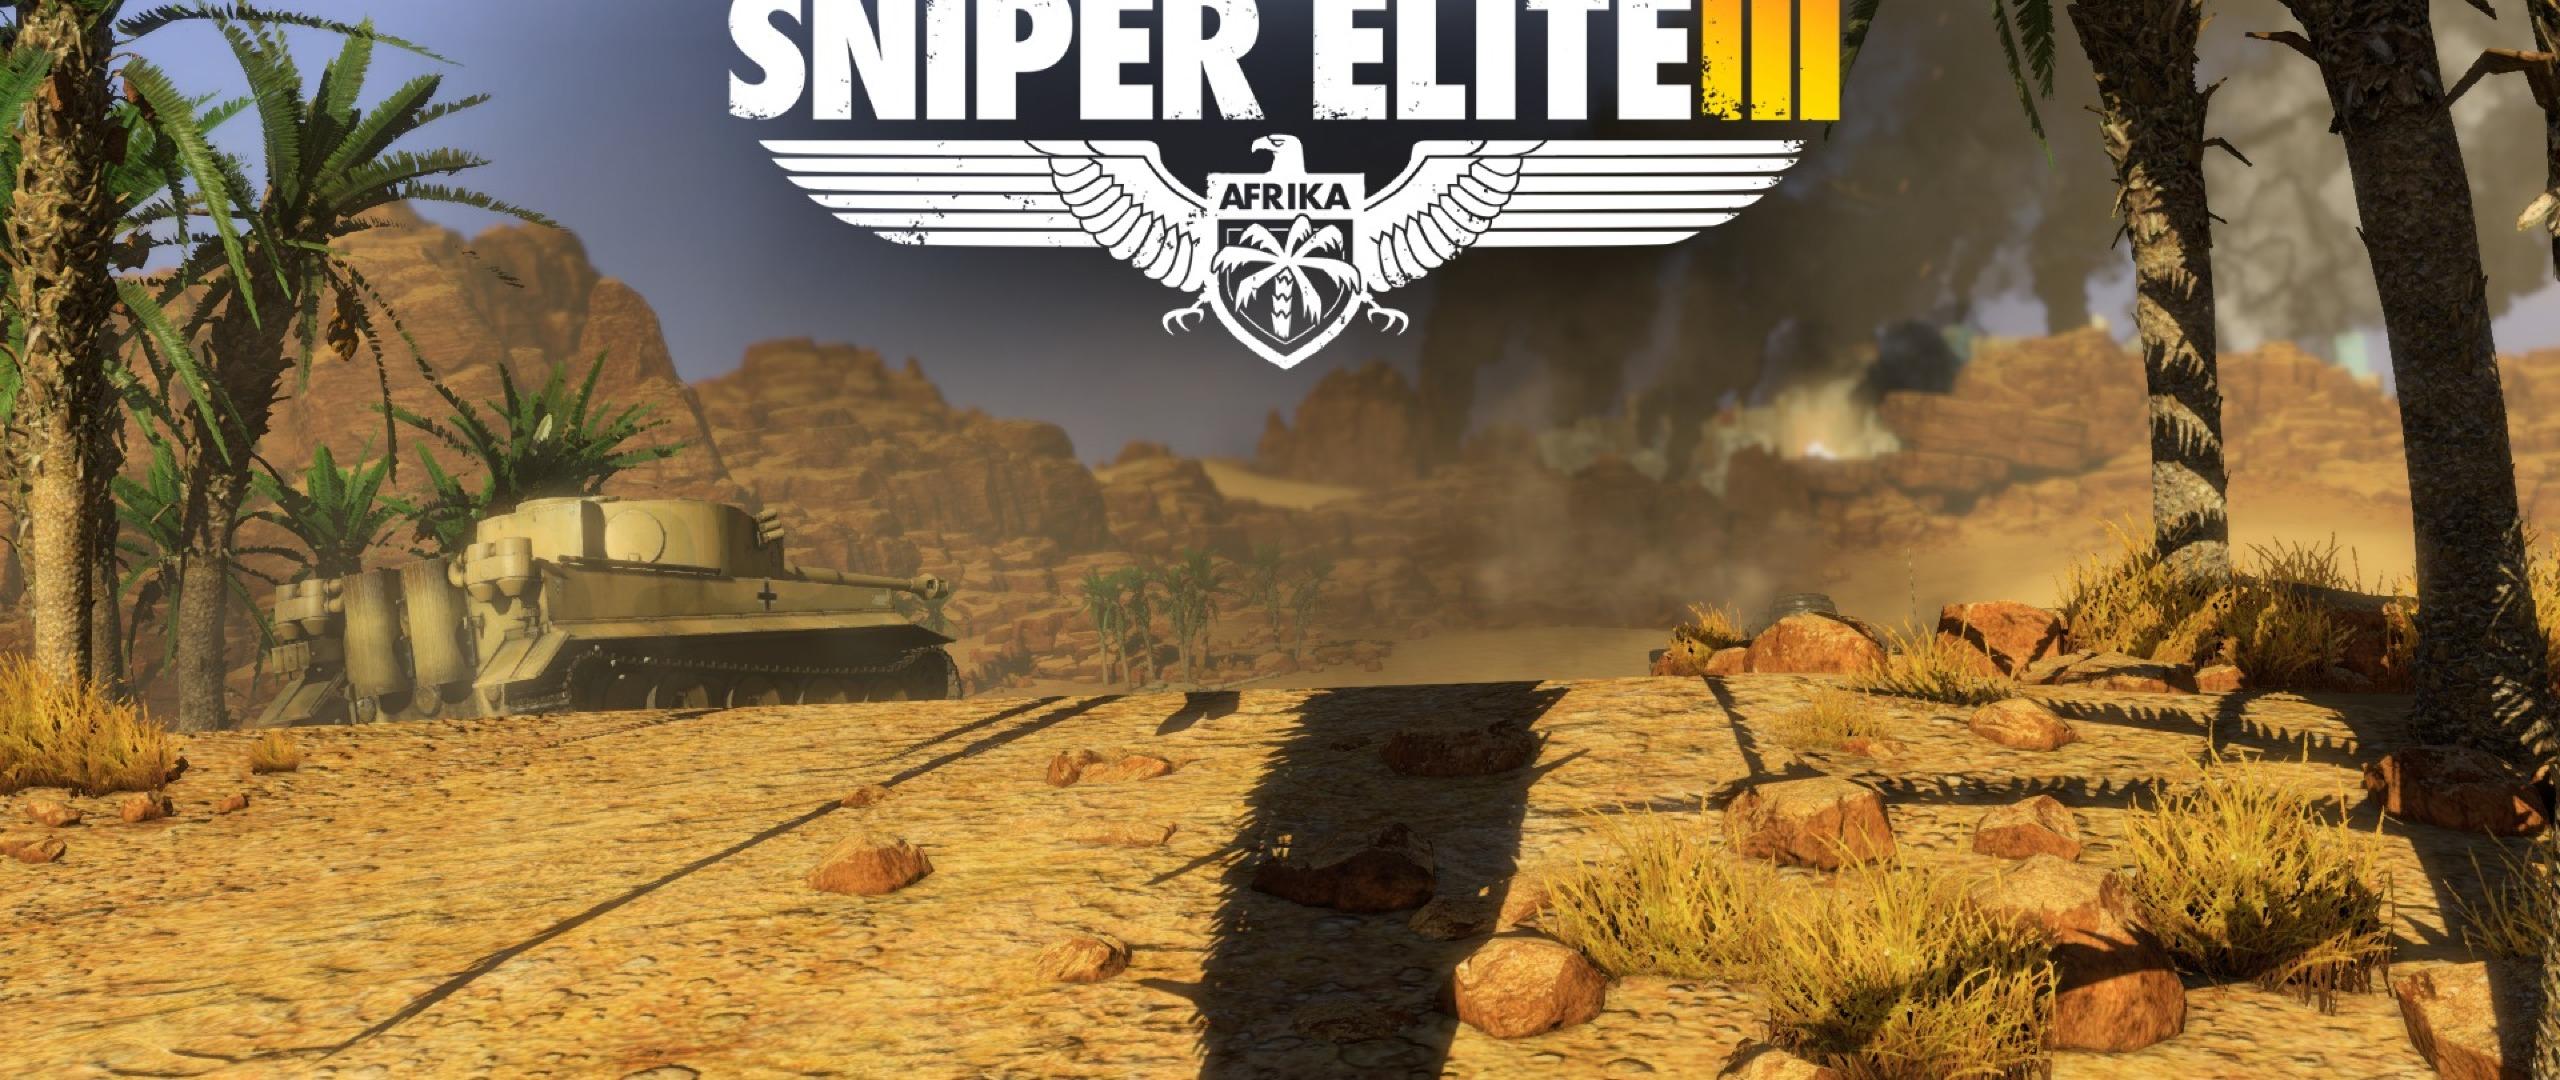 2560x1080 sniper elite iii sniper elite 3 charles fairbairn 2560x1080